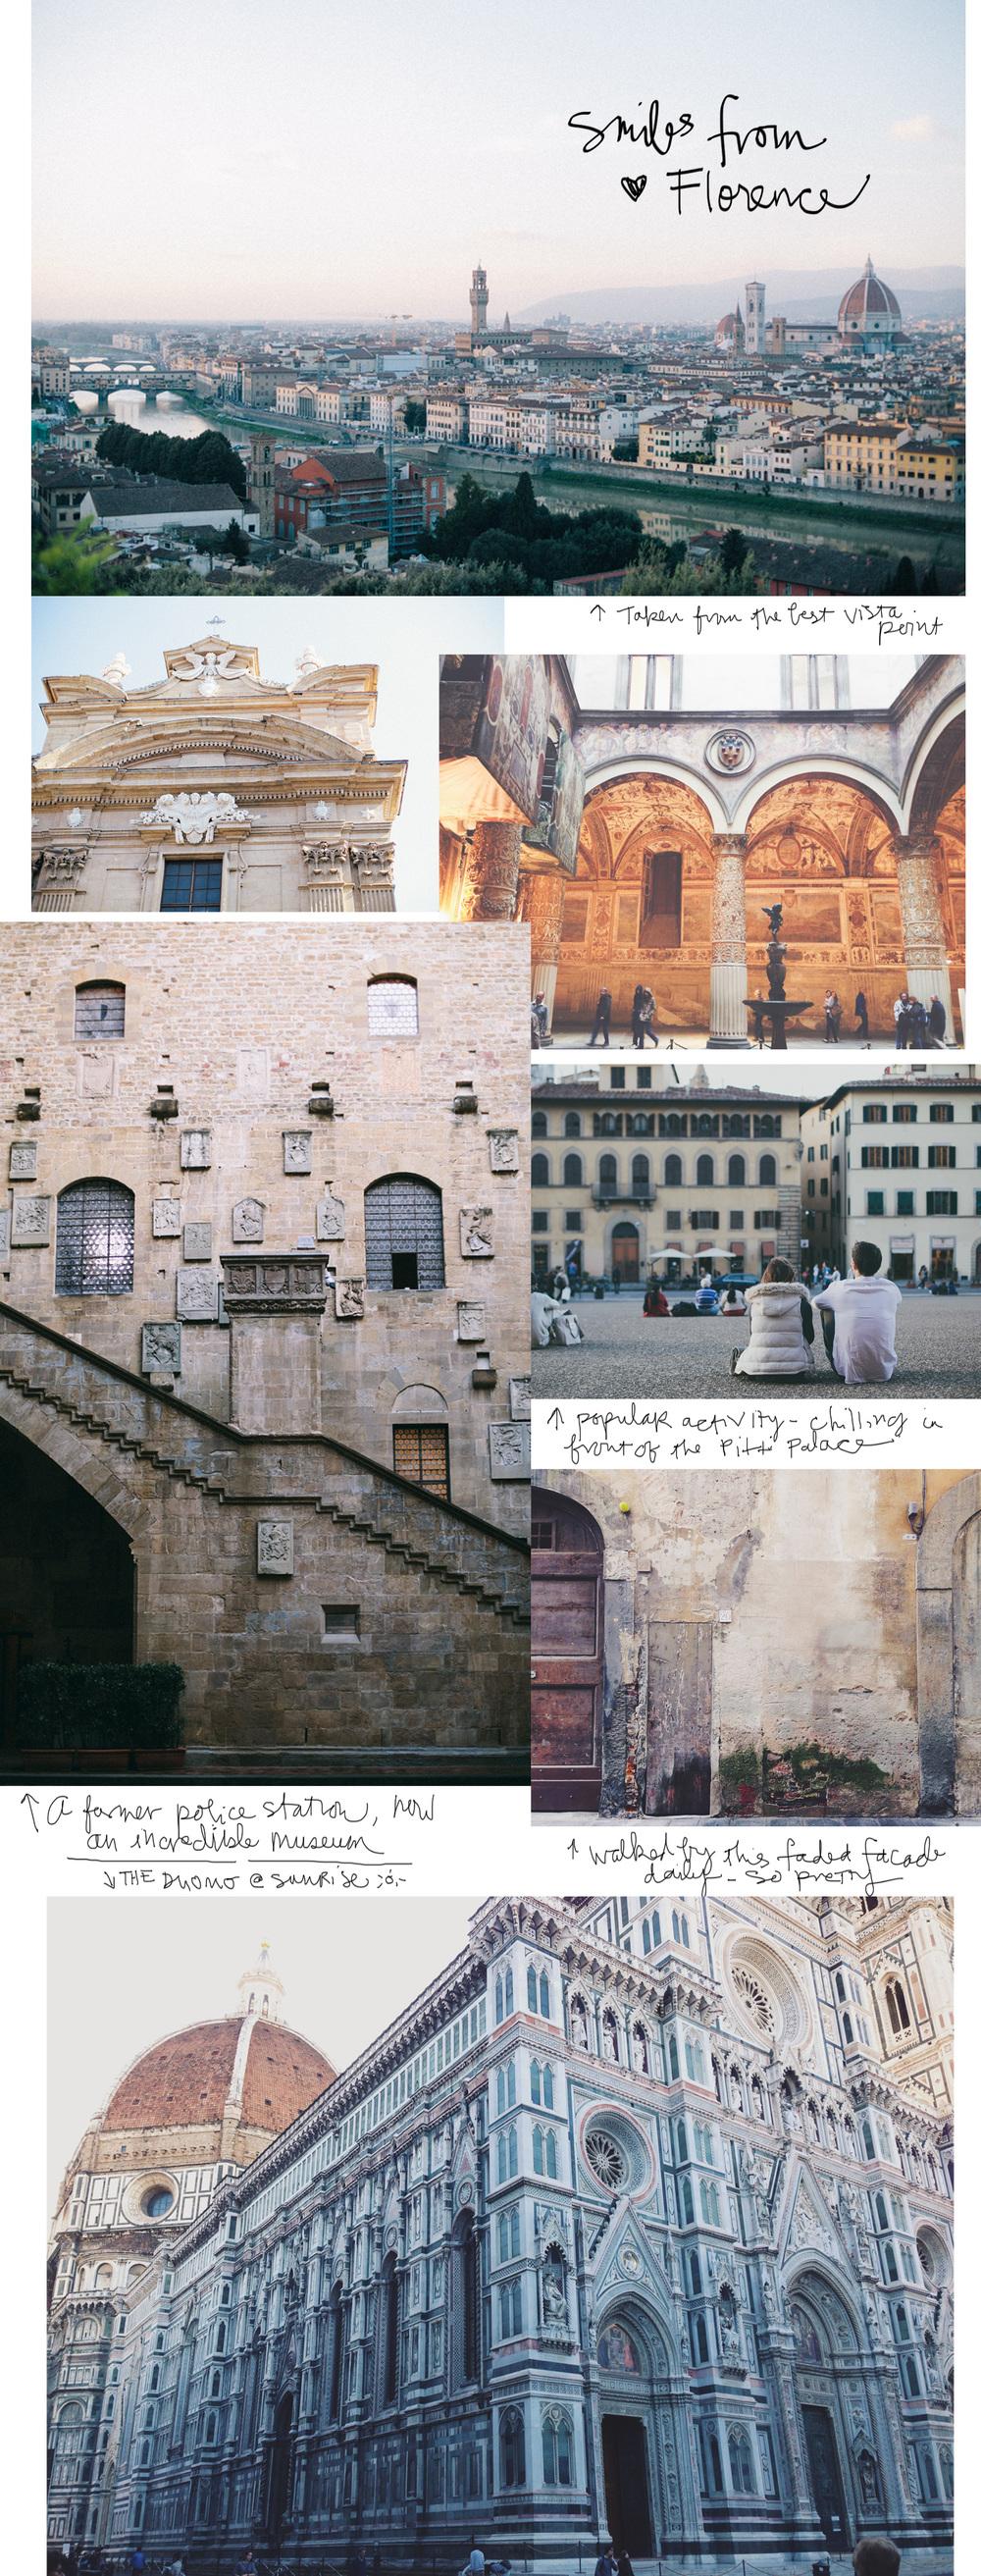 Naomi-Yamada-Italy-Florence-1.jpg